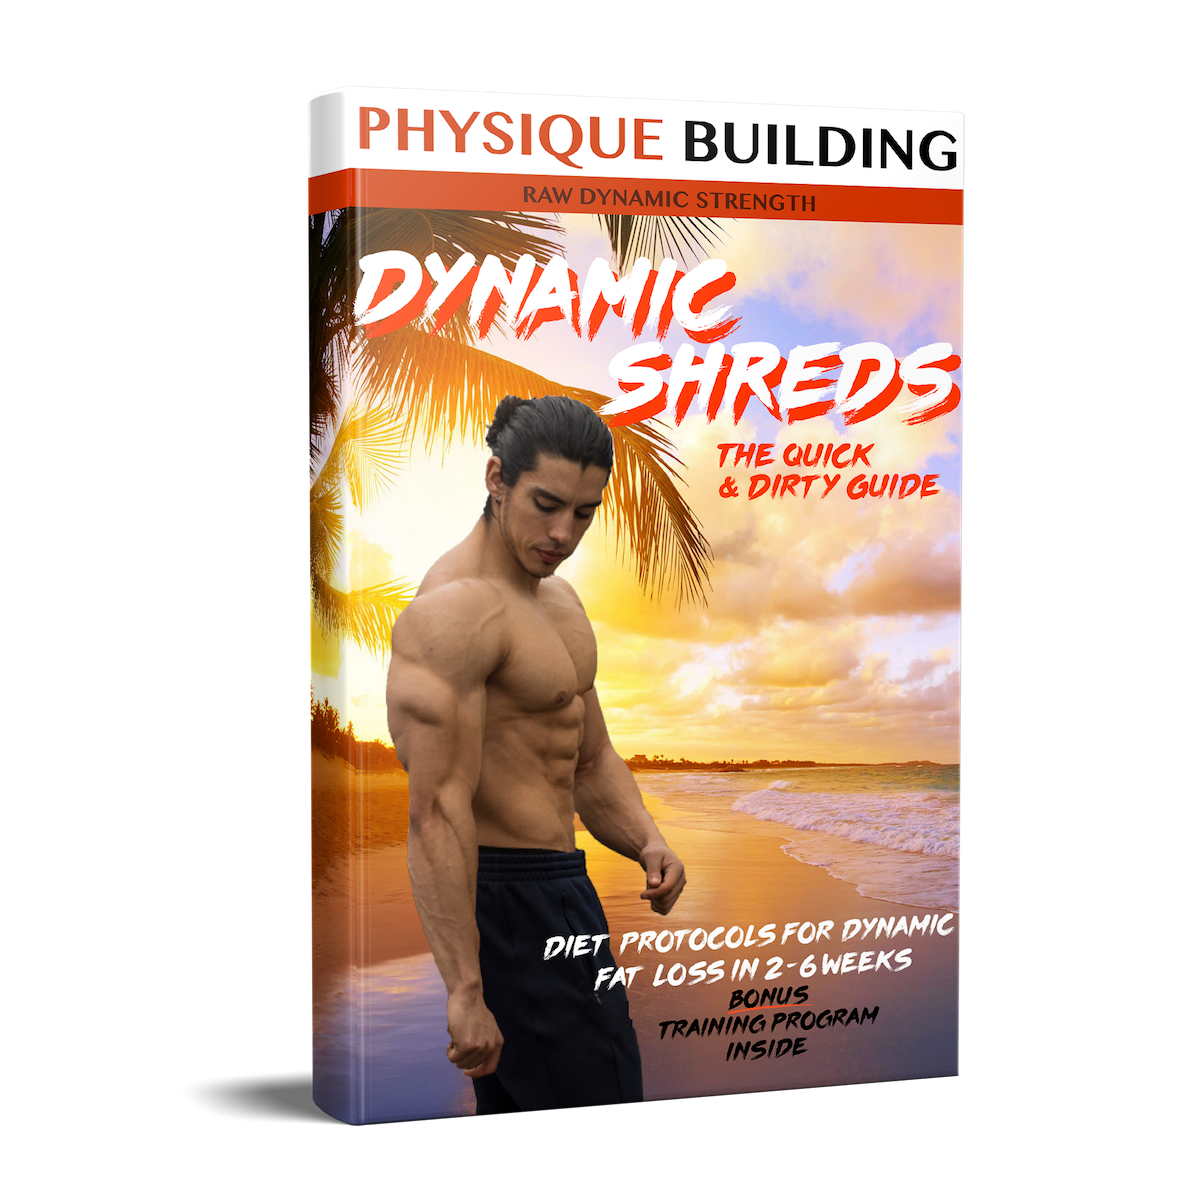 DynamicShreds1 copy.png